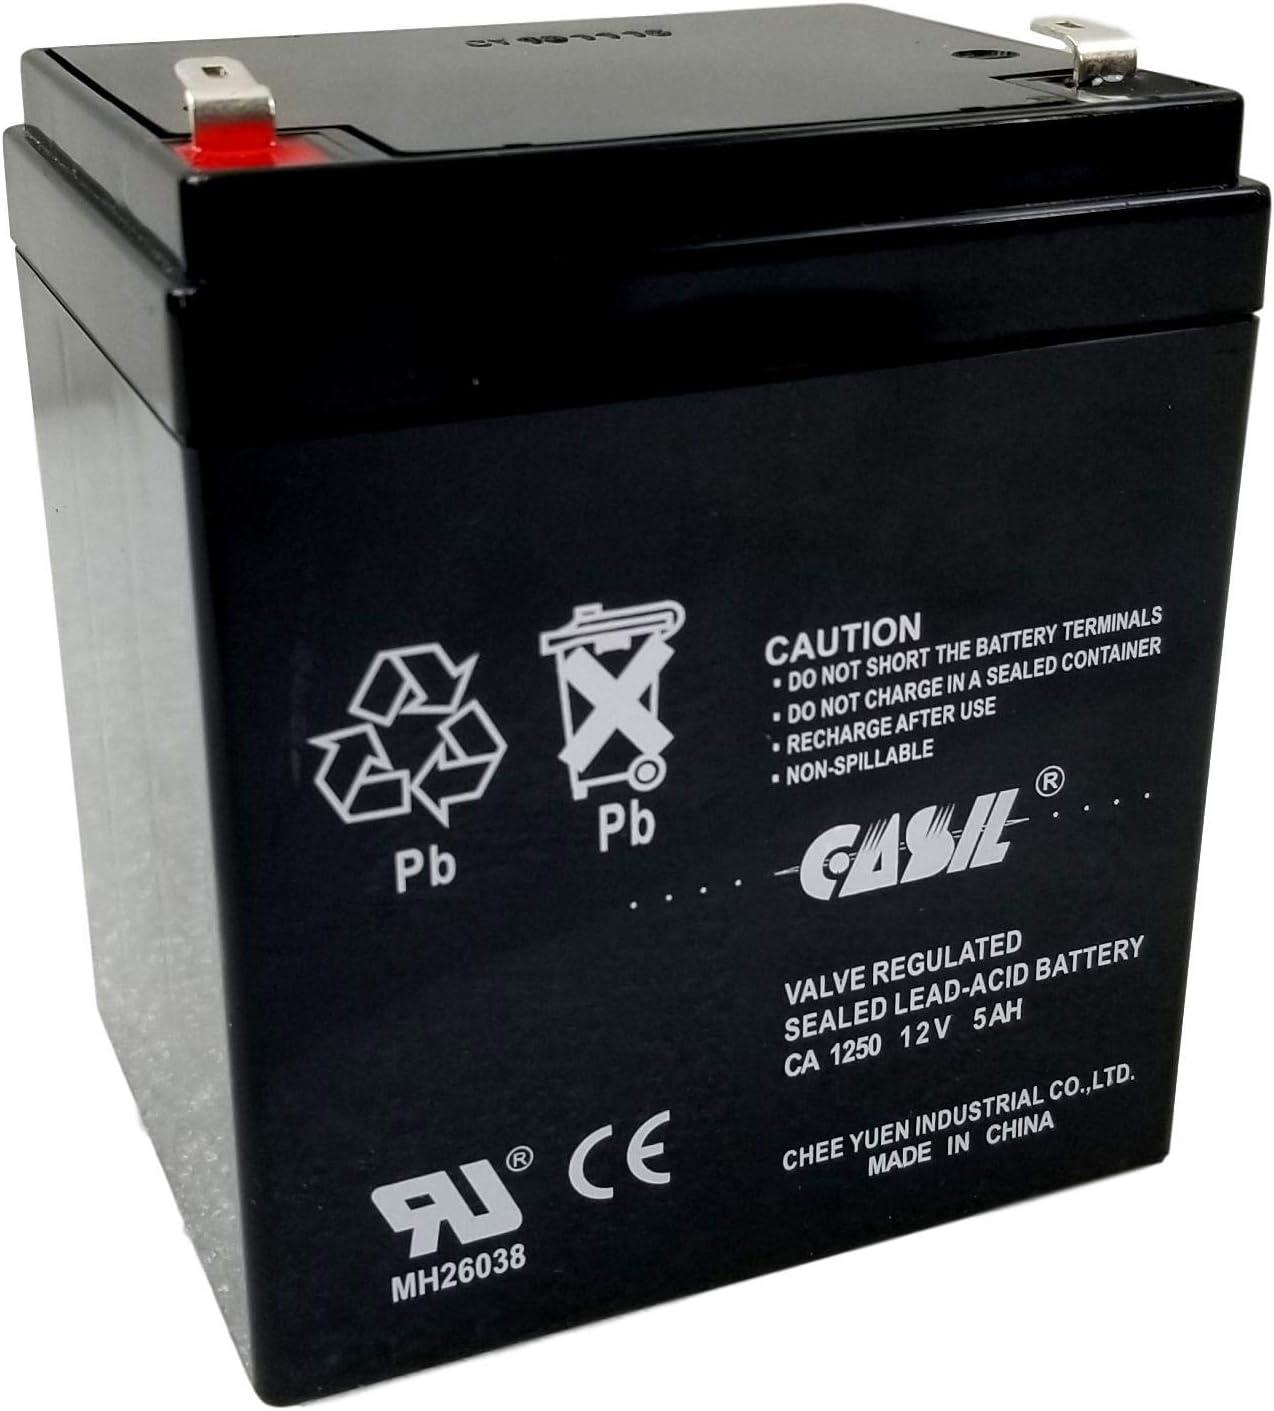 Casil Genuine CA1240 12V 4Ah SLA Upgrade to Genuine CA1250 12v 5ah Alarm Battery